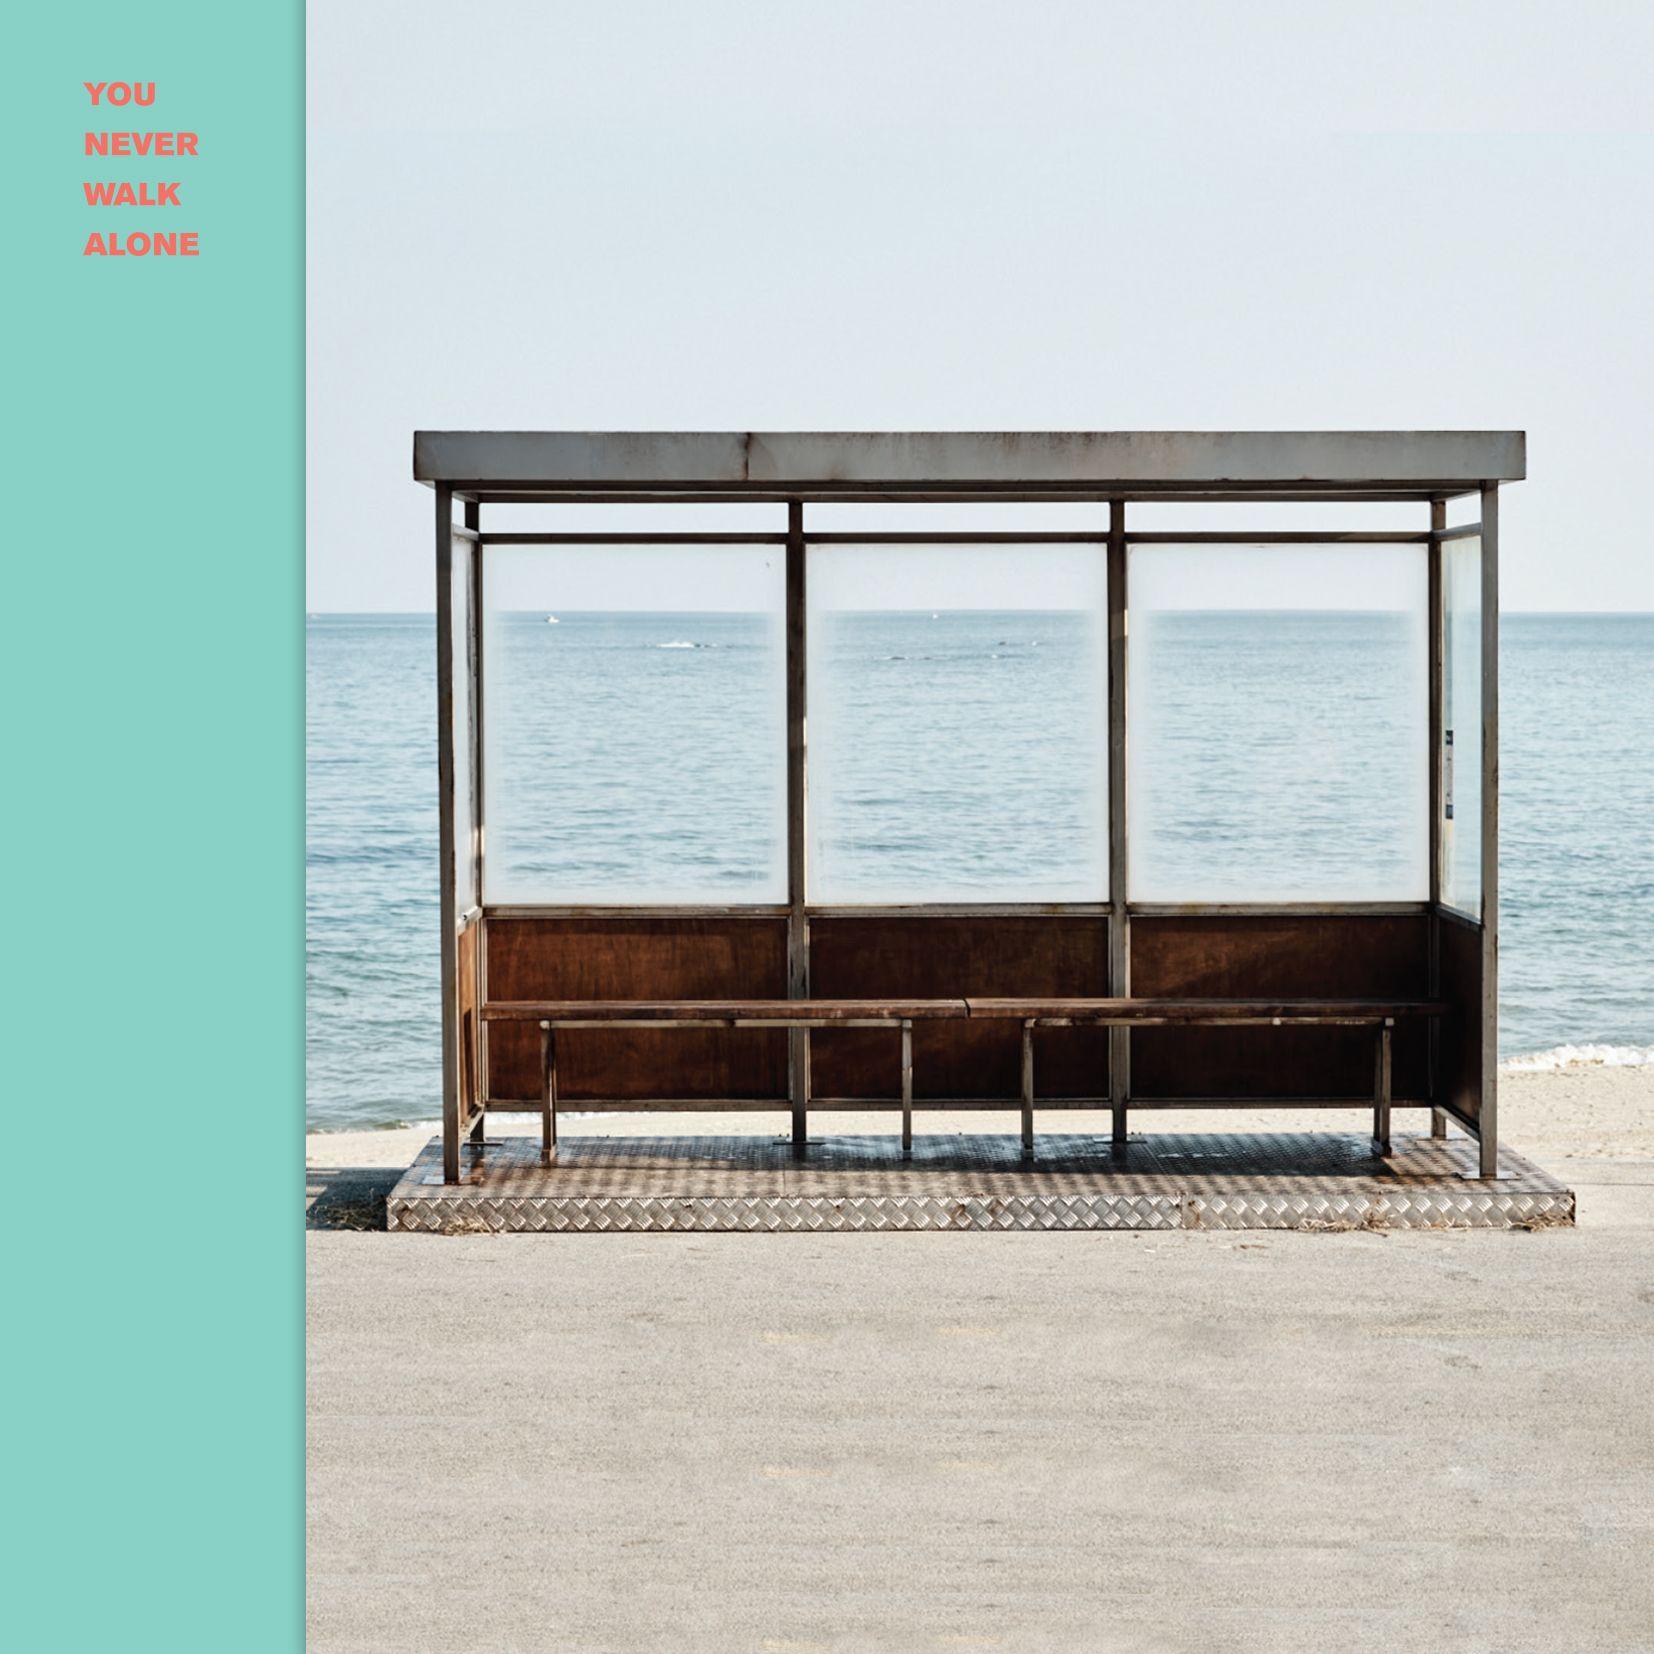 BTS (방탄소년단) - Spring Day (봄날) » Color Coded Lyrics